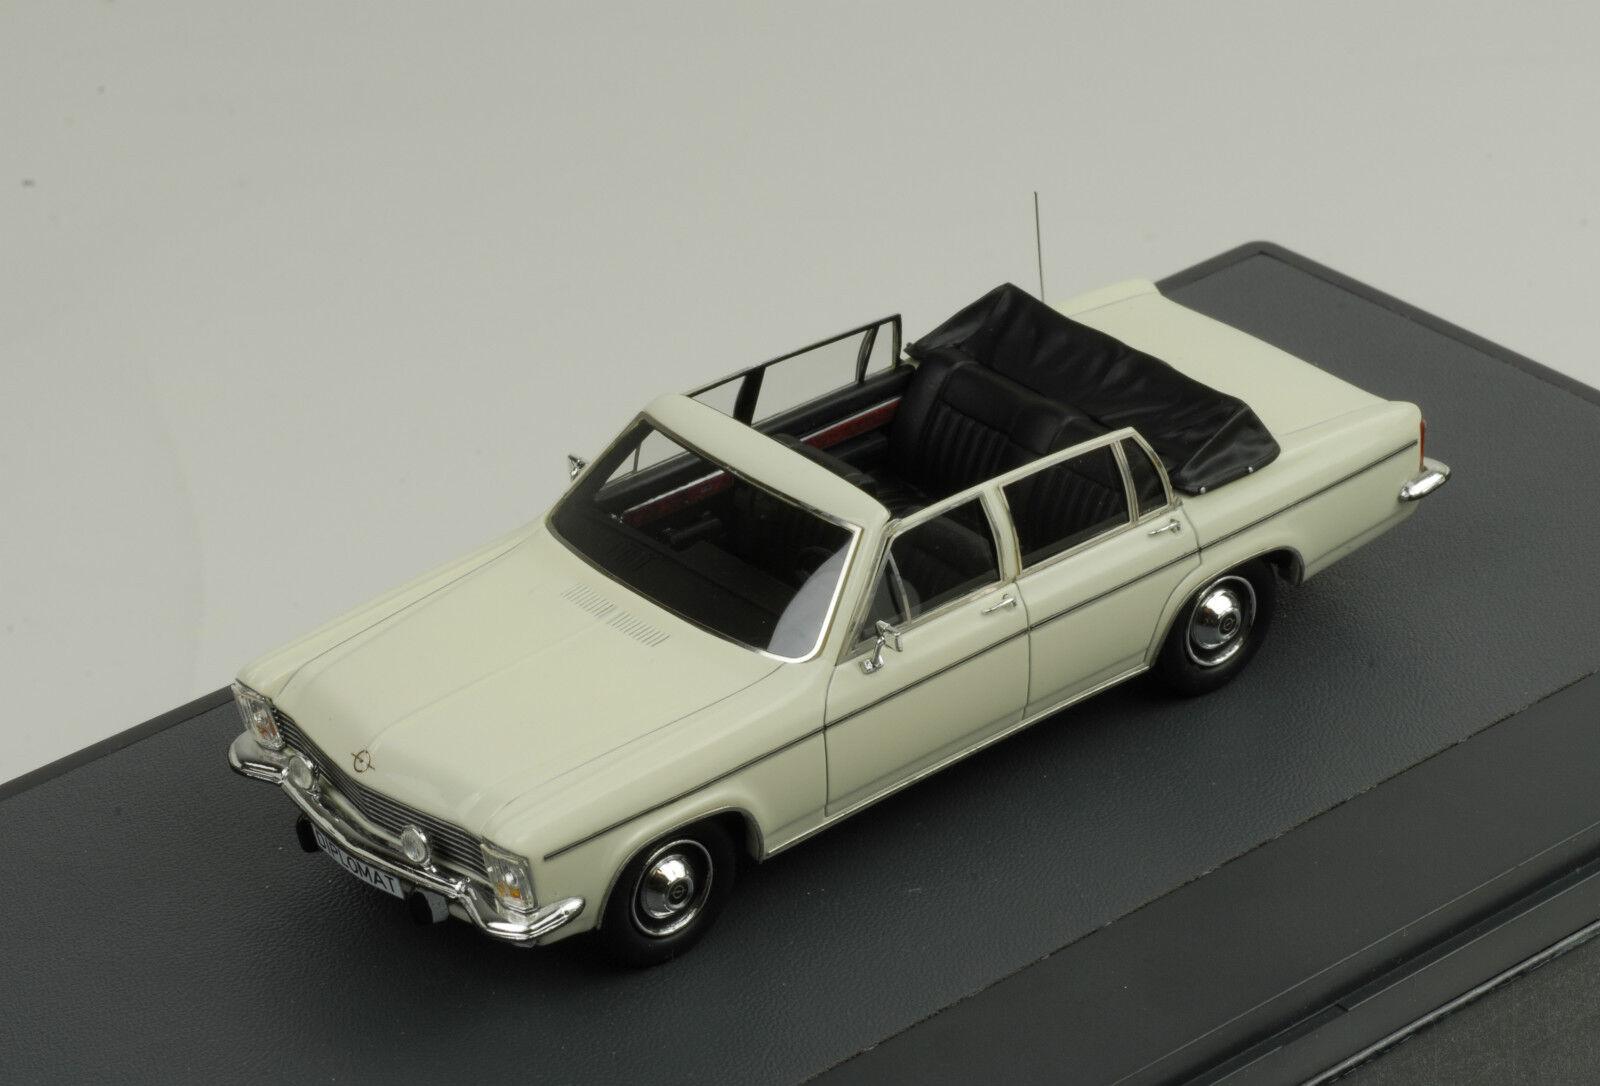 1971 Opel Diplomat 5.4 Fissore Descapotable Cabriolet blancoo blancoo 1 43 Matrix